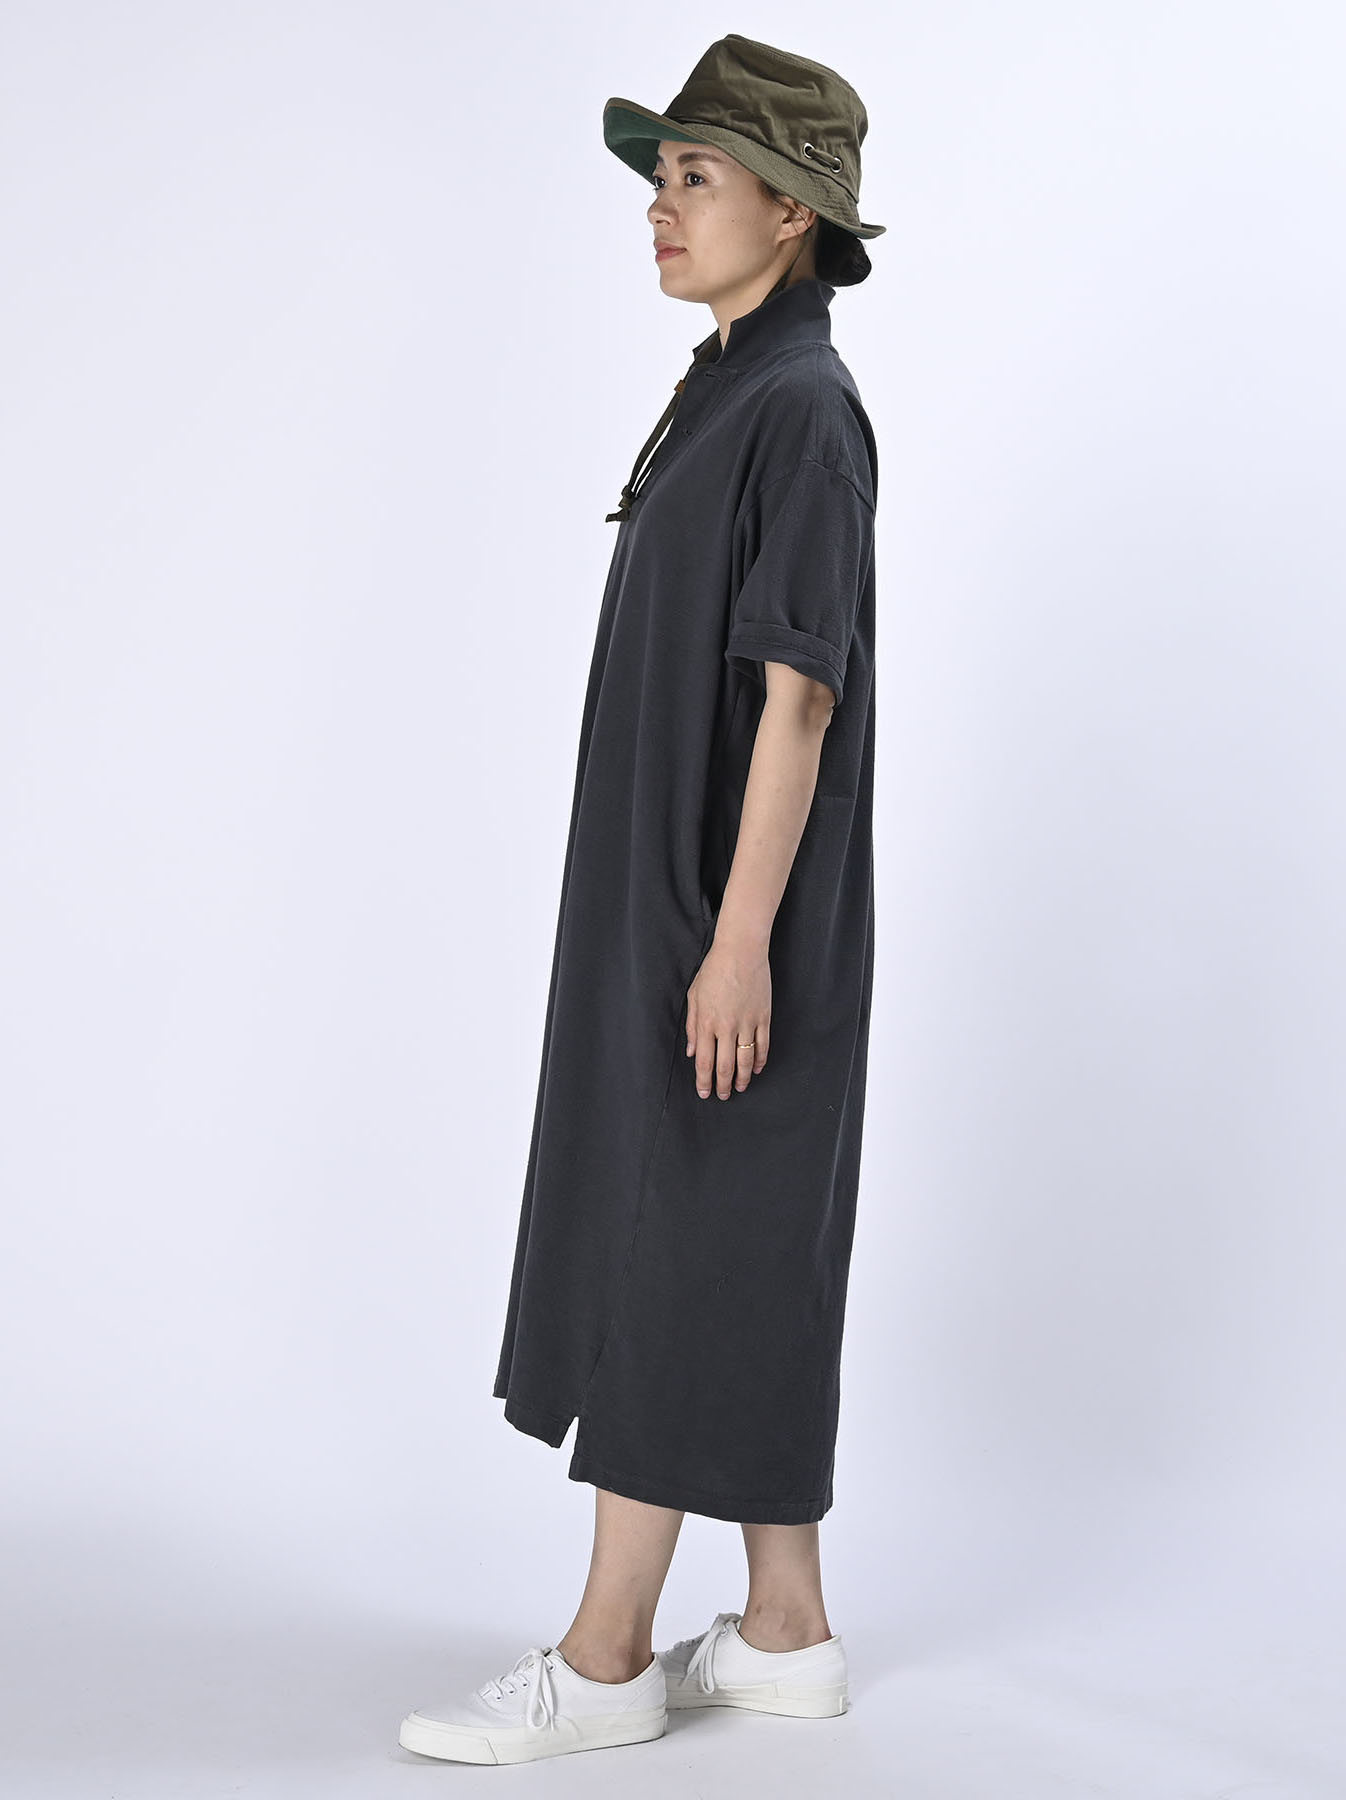 Kanoko Ocean Shiokaze Short-sleeved Polo Dress (0521)-3